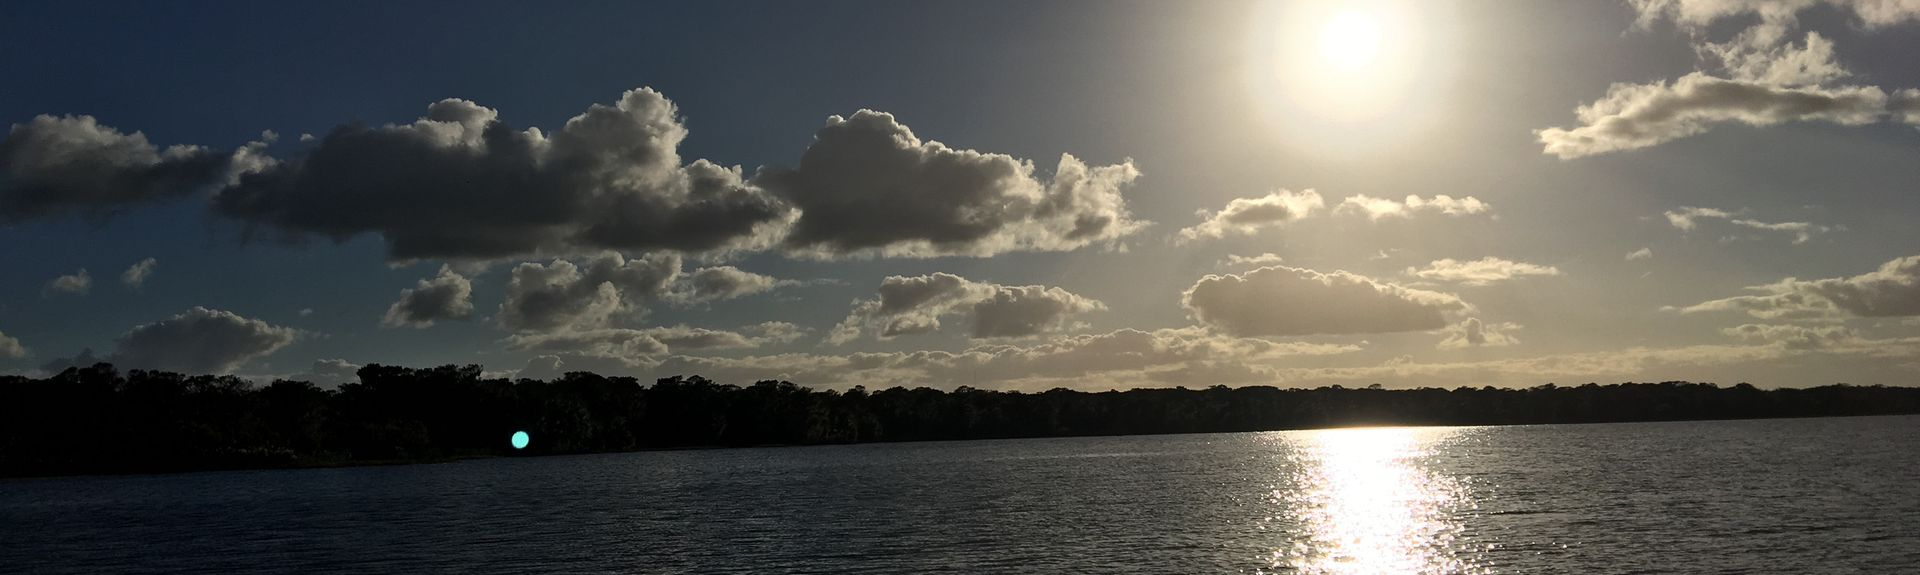 Oviedo, Florida, United States of America